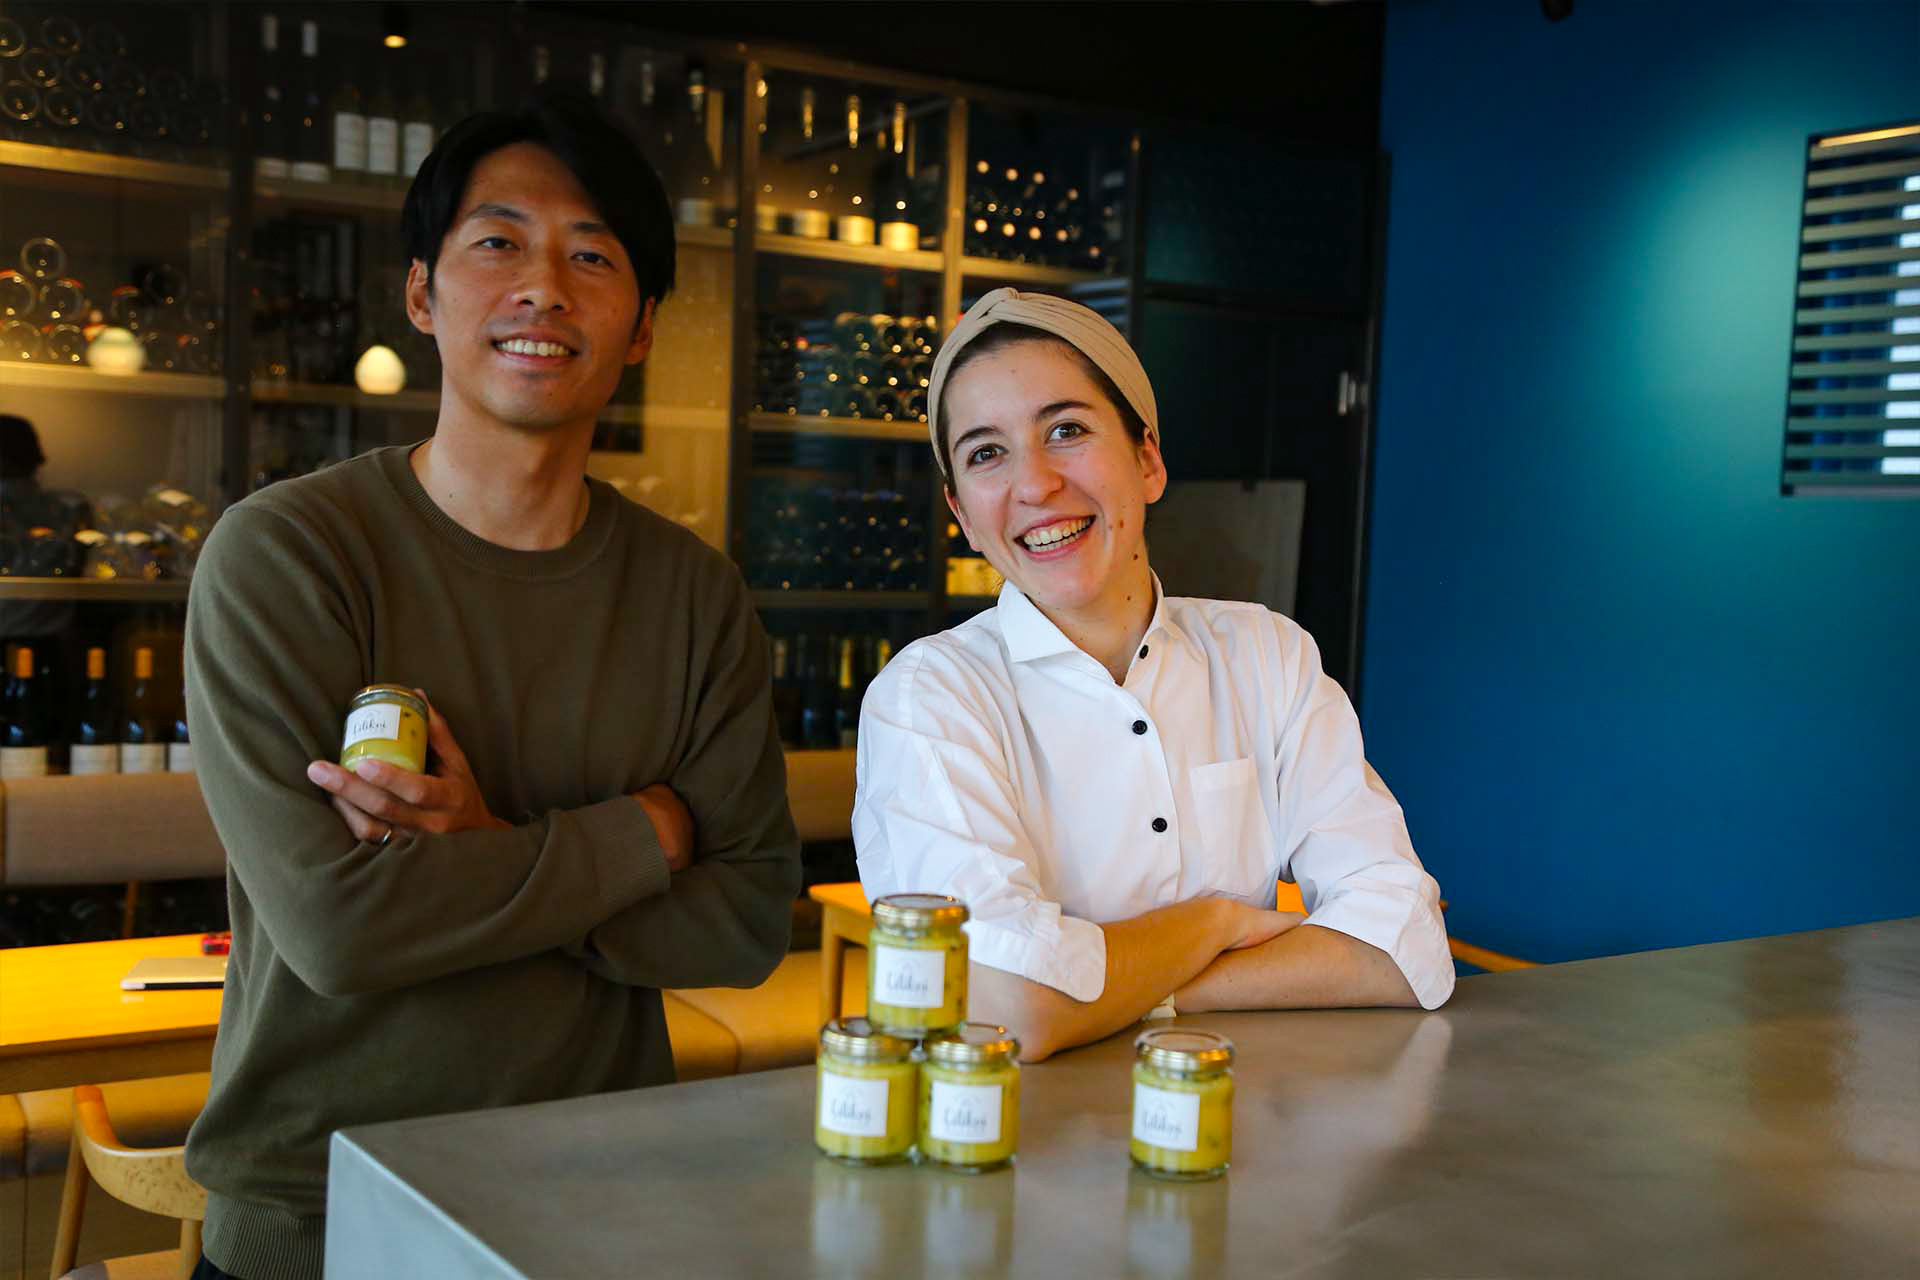 Ryo's Farm - アペロ ワインバー / apéro WINEBAR - vins et petits plats français - Minami Aoyama Tokyo